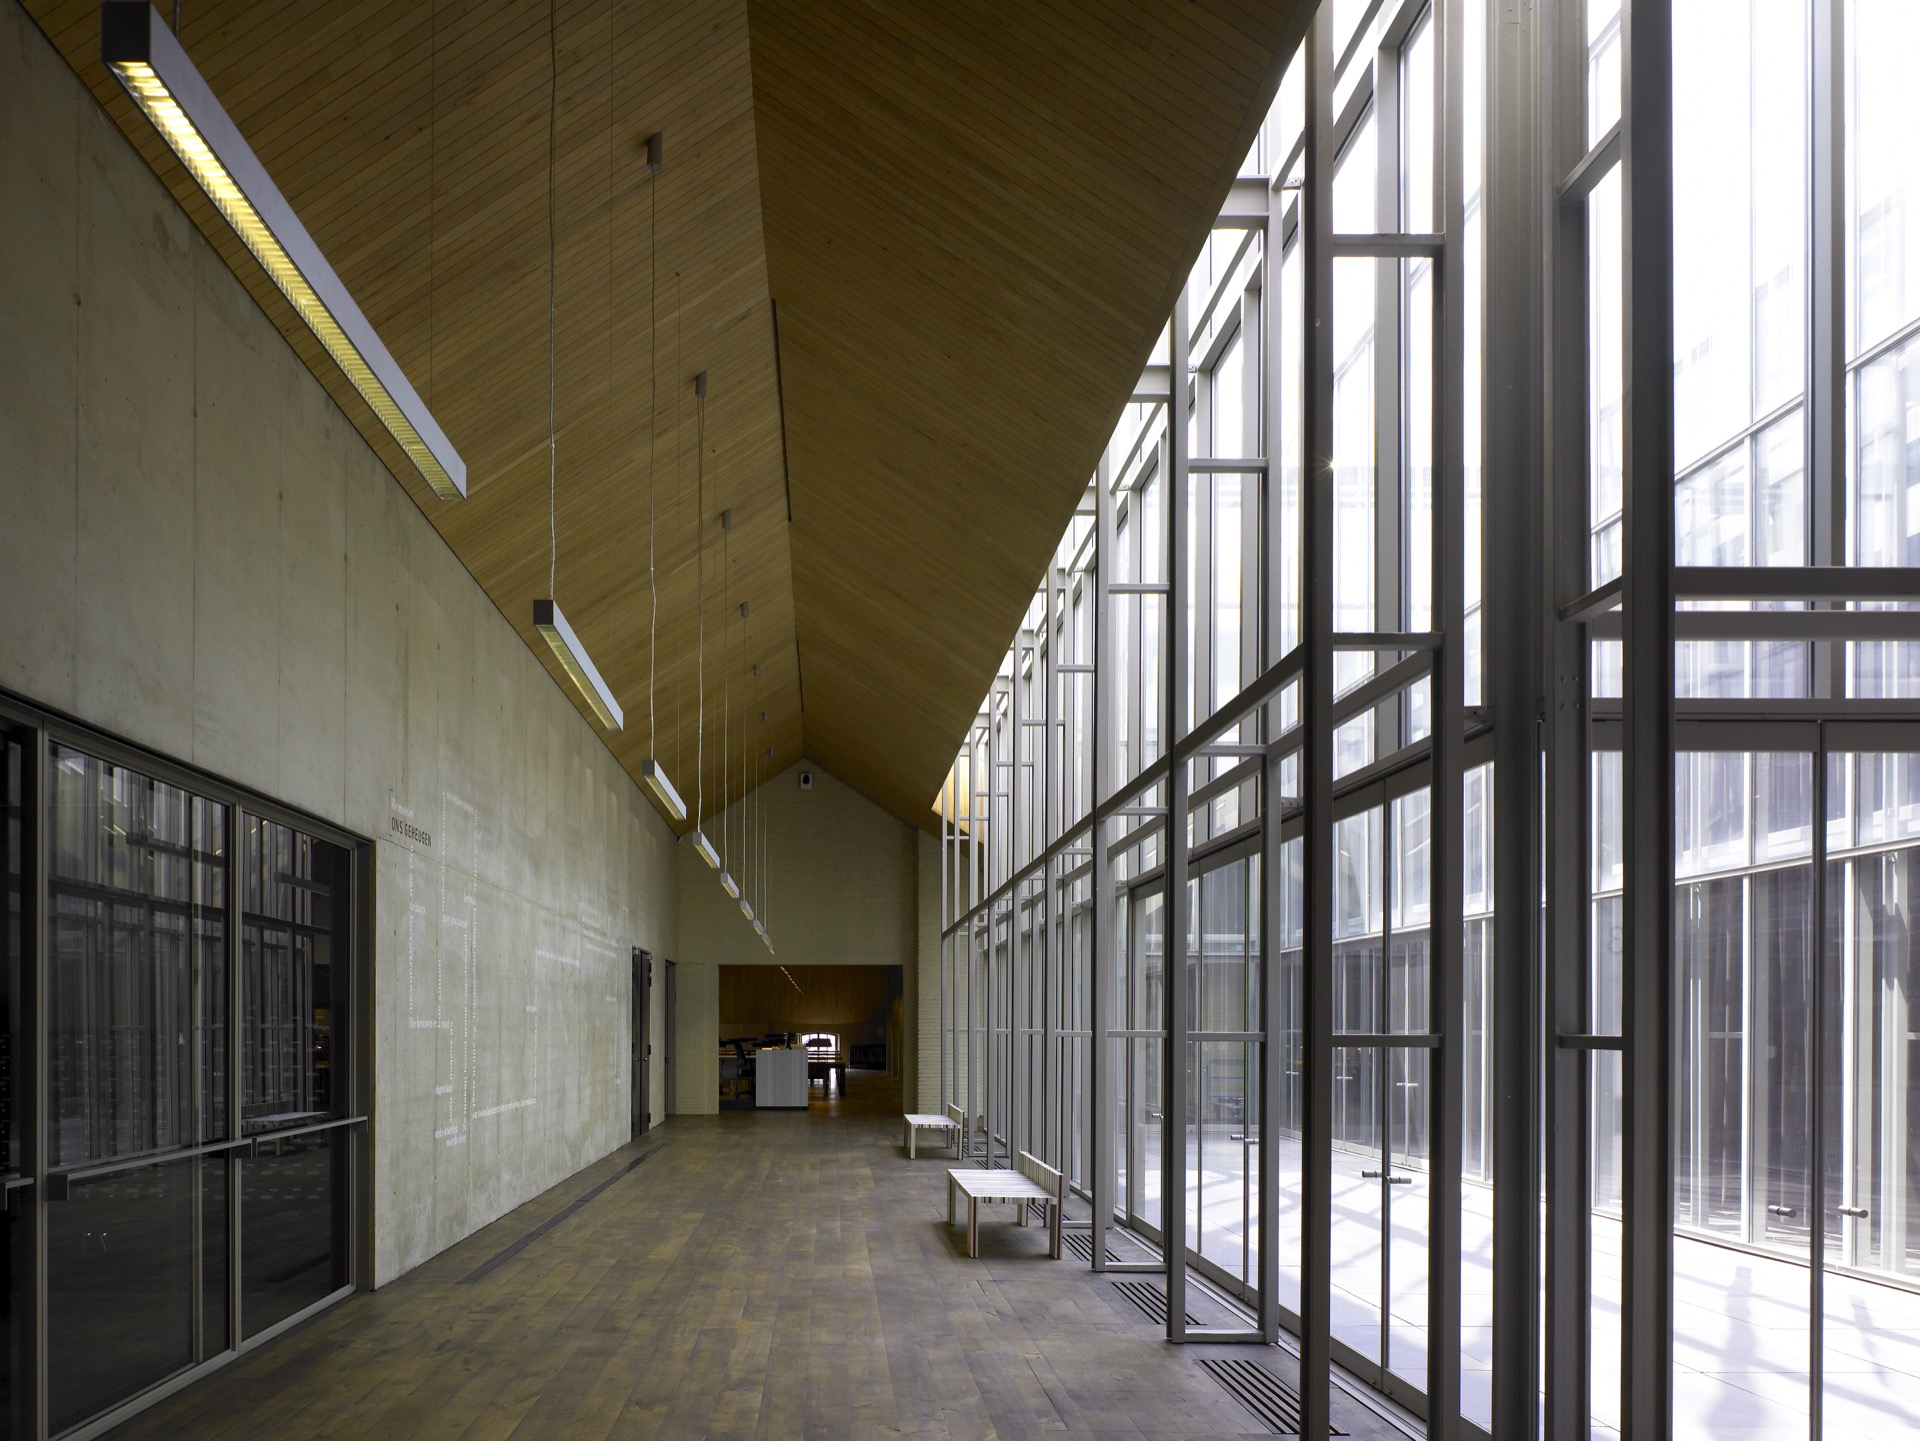 St Felix Pakhuis Antwerpen library building architecture design interior view